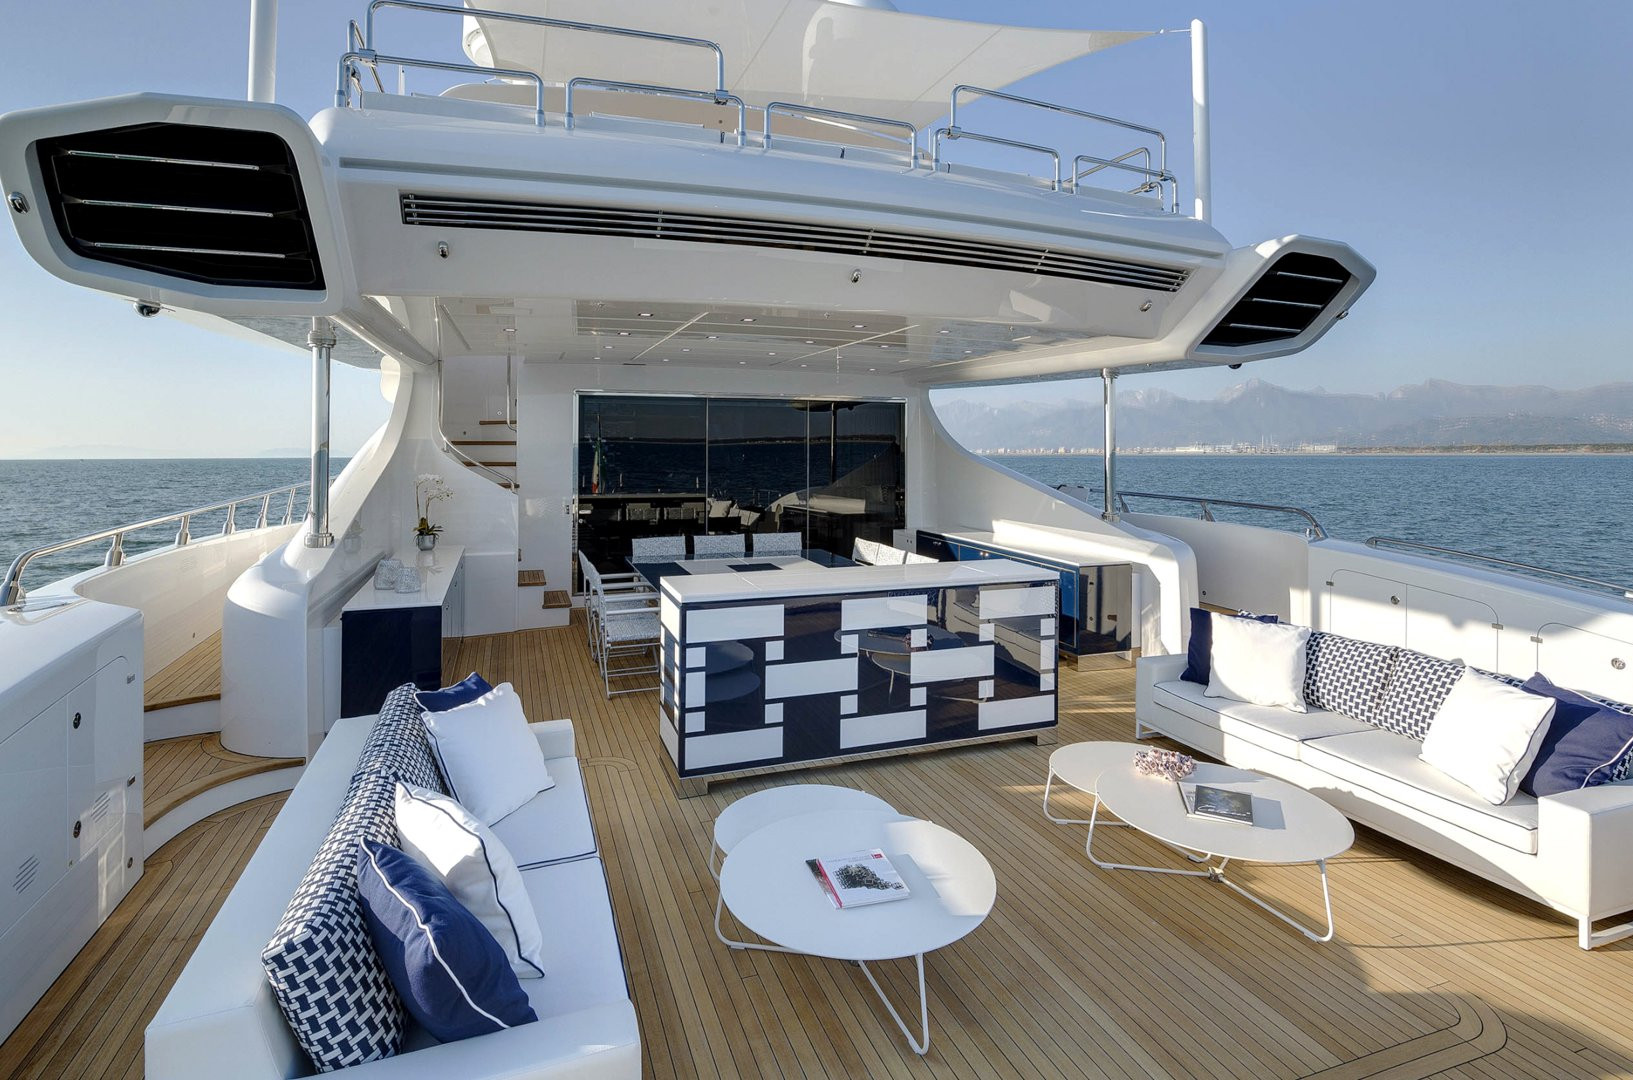 Yacht DA VINCI - lounging, sun bathing, and Al fresco dining